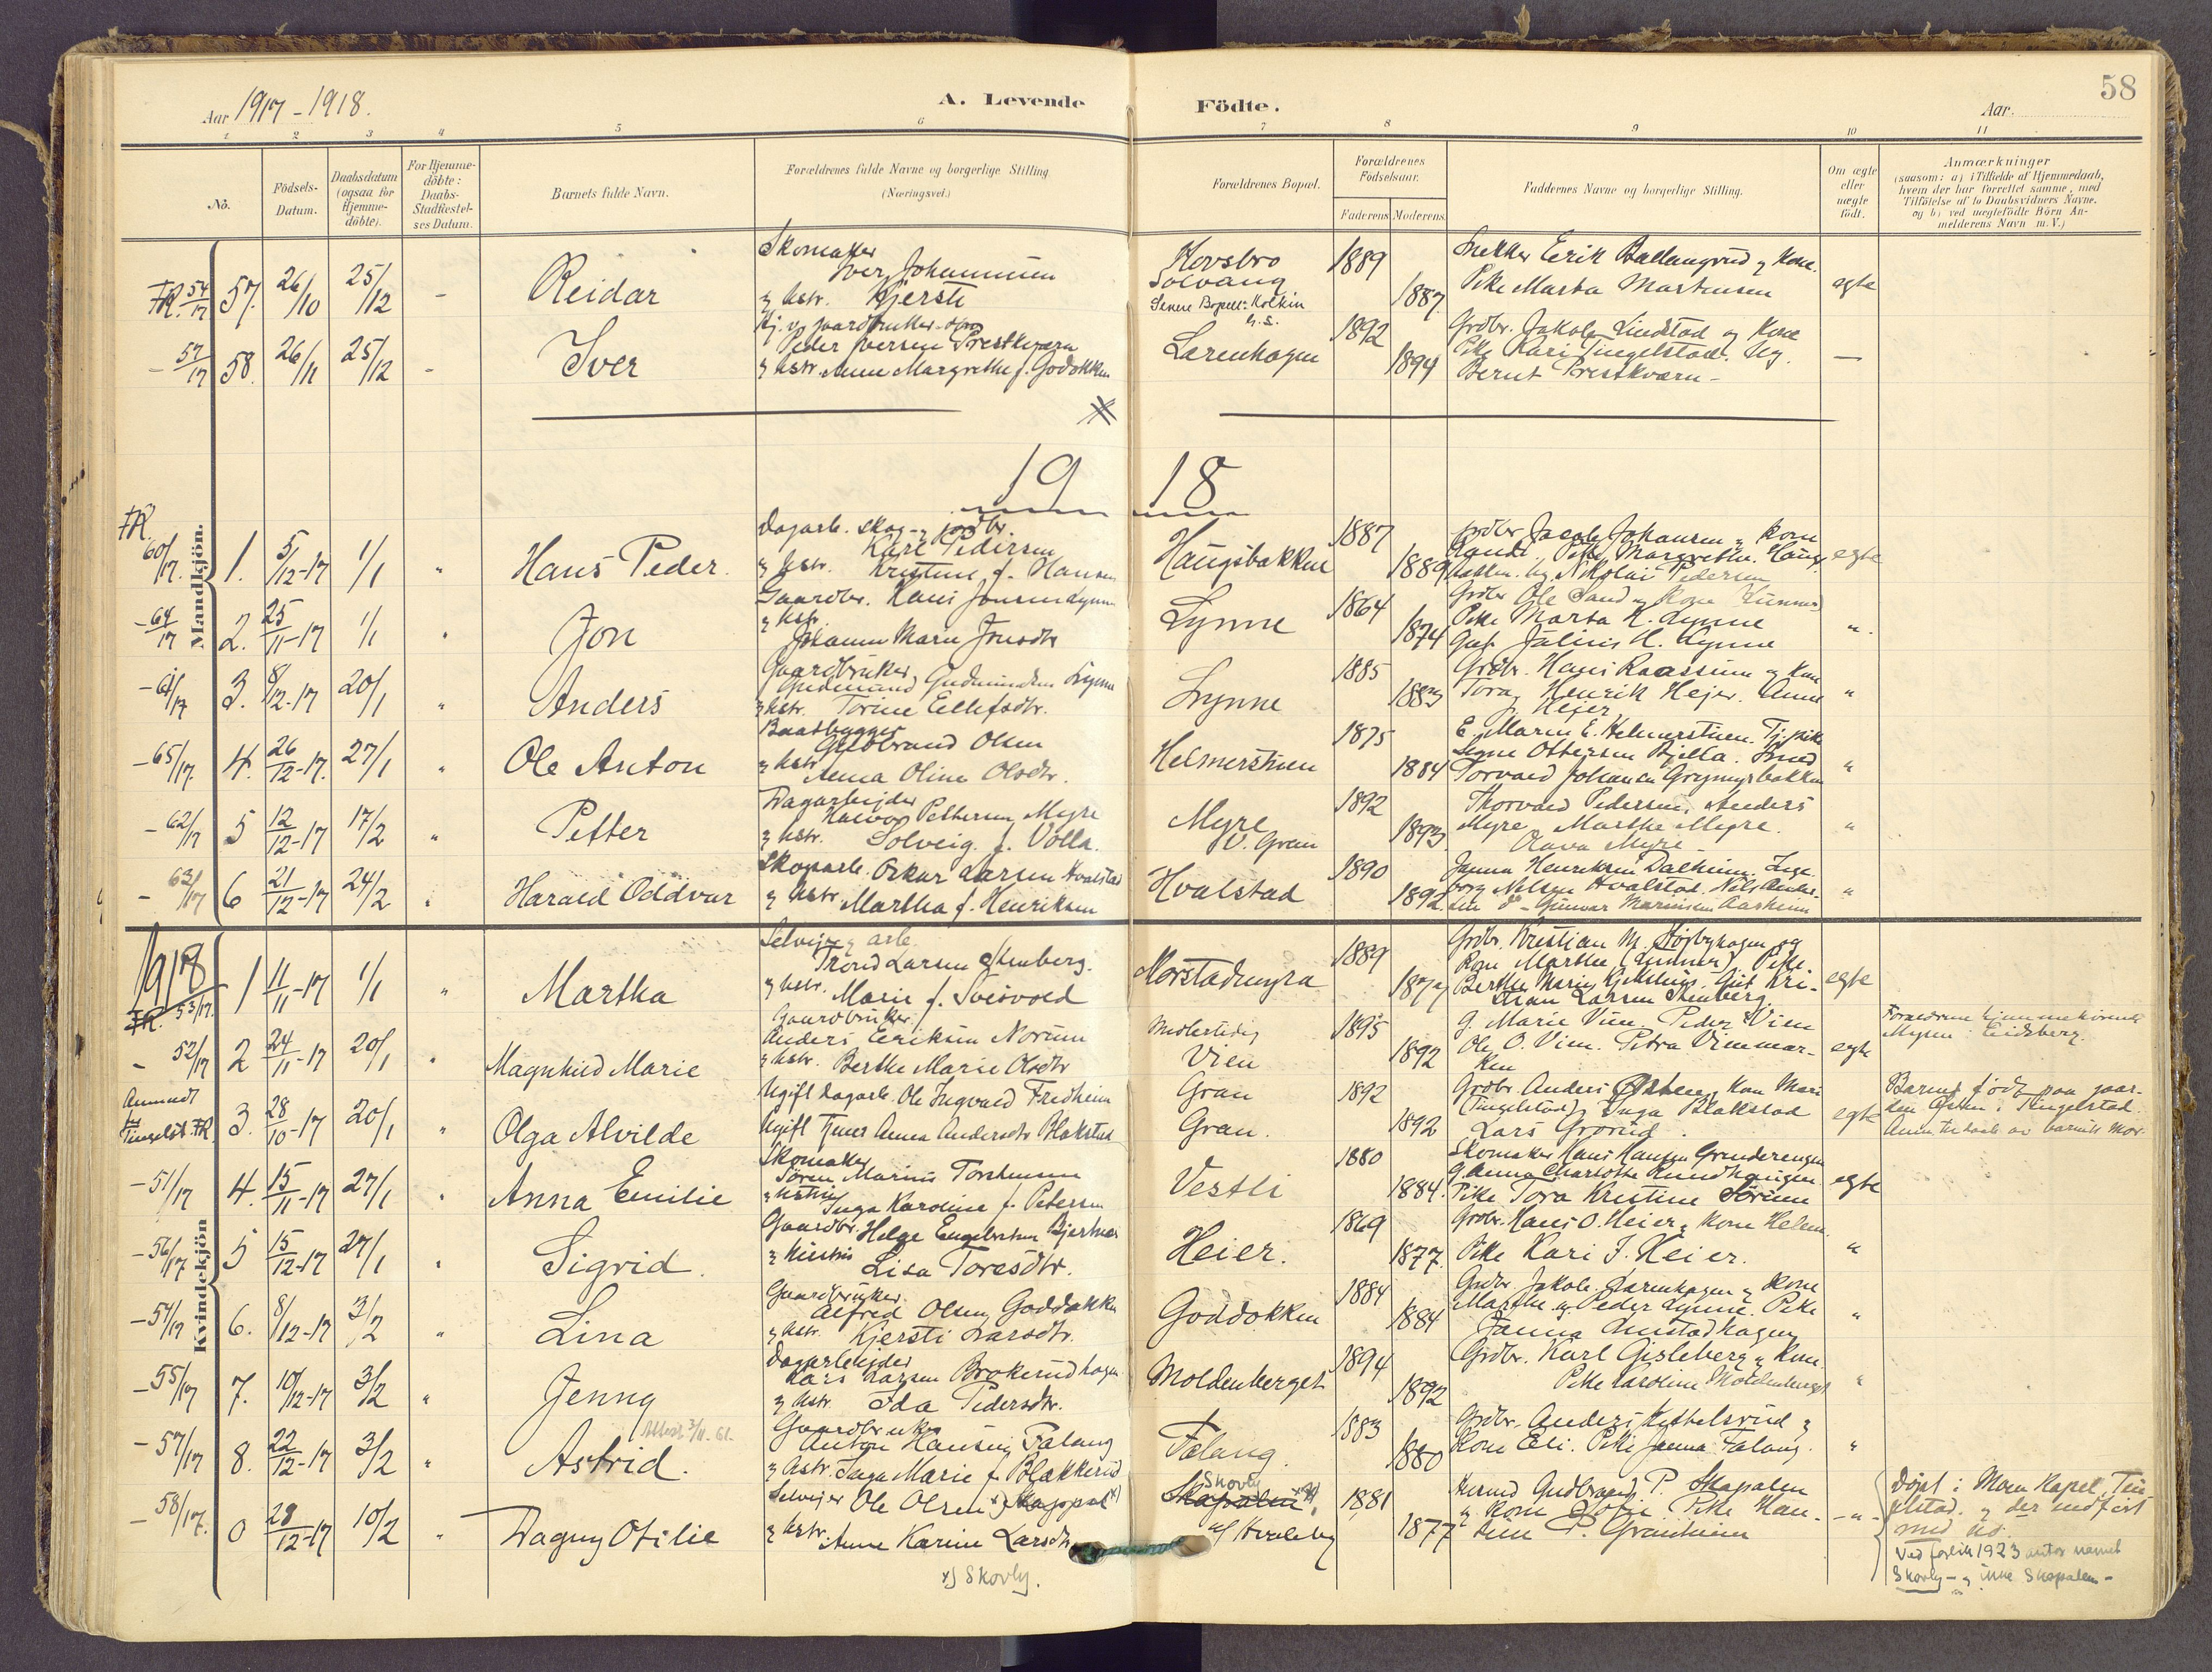 SAH, Gran prestekontor, Ministerialbok nr. 21, 1908-1932, s. 58